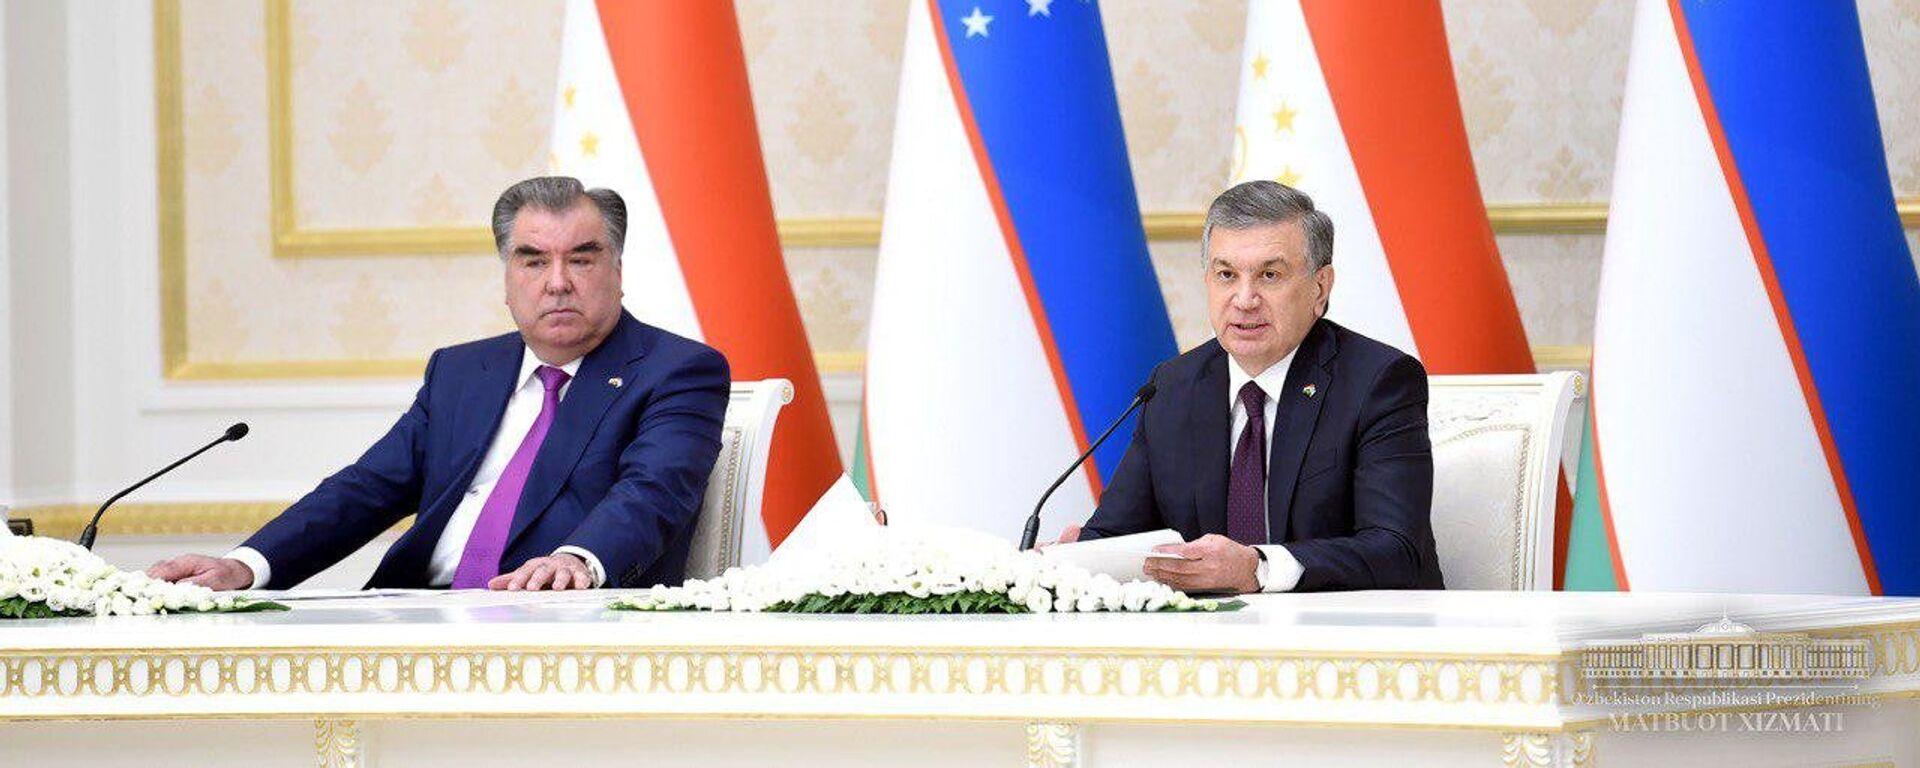 Президент Таджикистана Эмомали Рахмон и Президент Узбекистана Шавкат Мирзиёев на переговорах - Sputnik Таджикистан, 1920, 05.07.2021